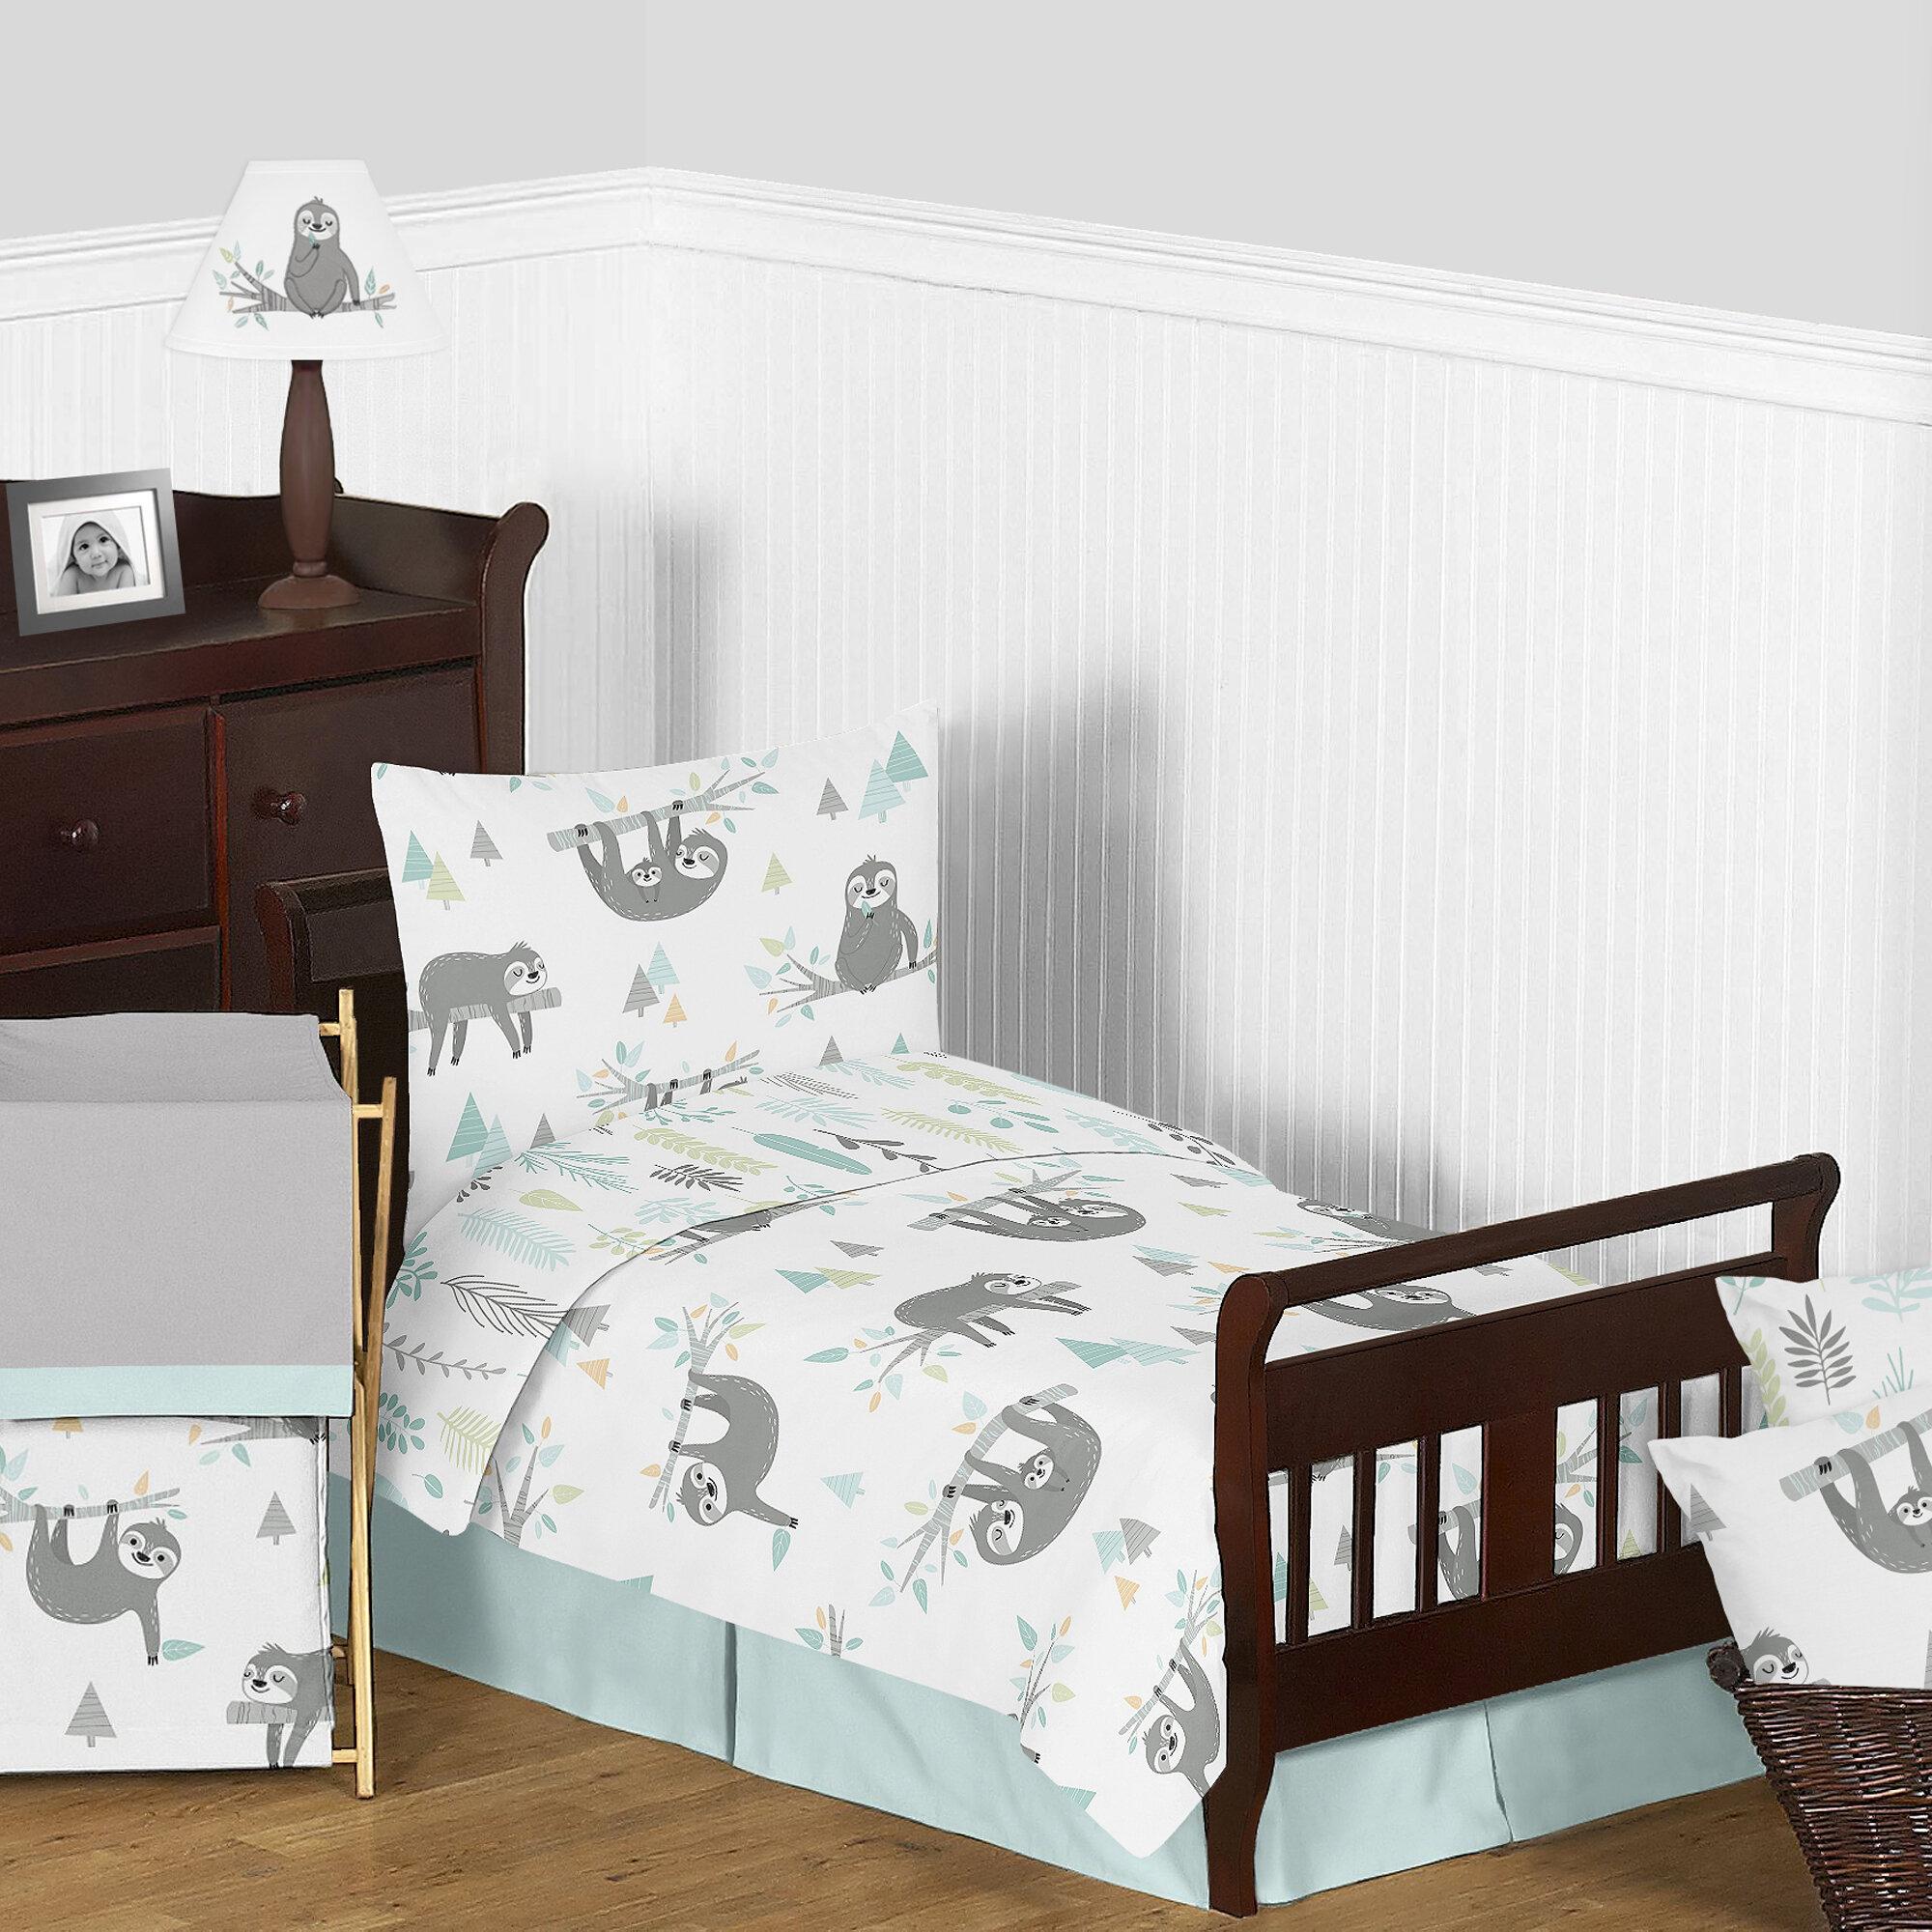 Sweet Jojo Designs Aqua And Grey Sloth Collection Sloth 5 Piece Toddler Bedding Set Wayfair